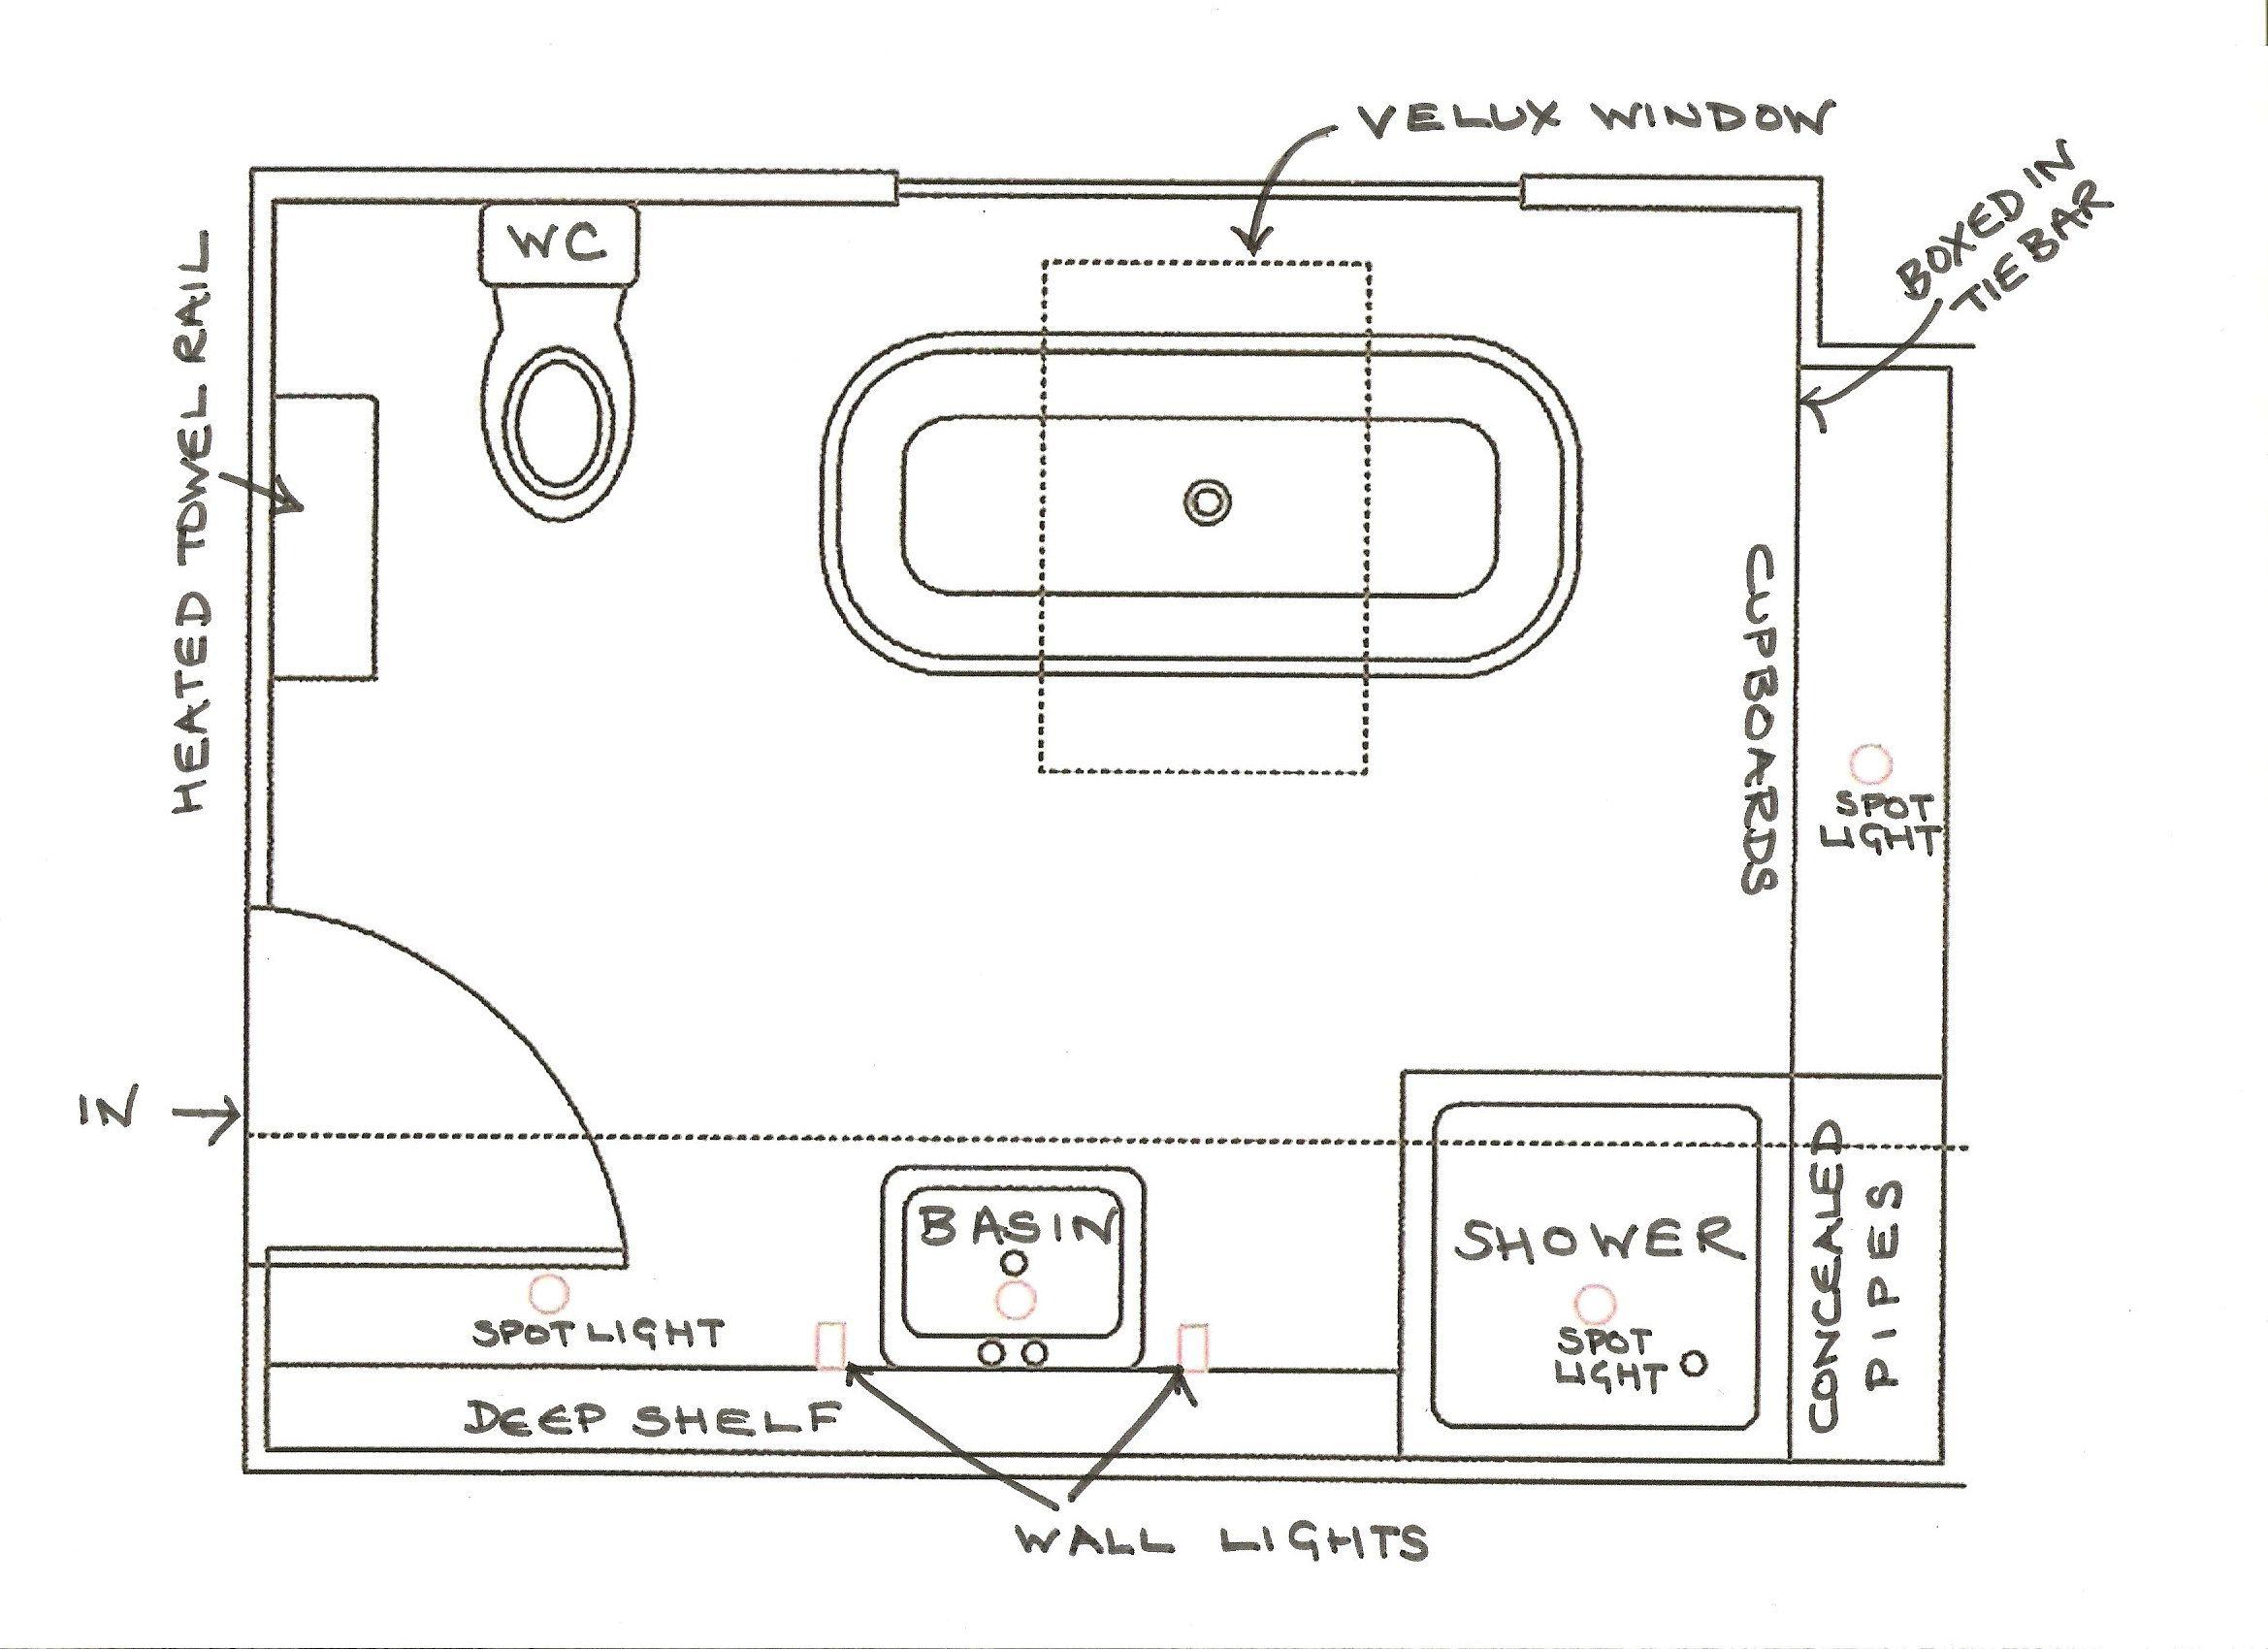 6 x 12 bathroom floor plans | bathroom design 2017-2018 ...